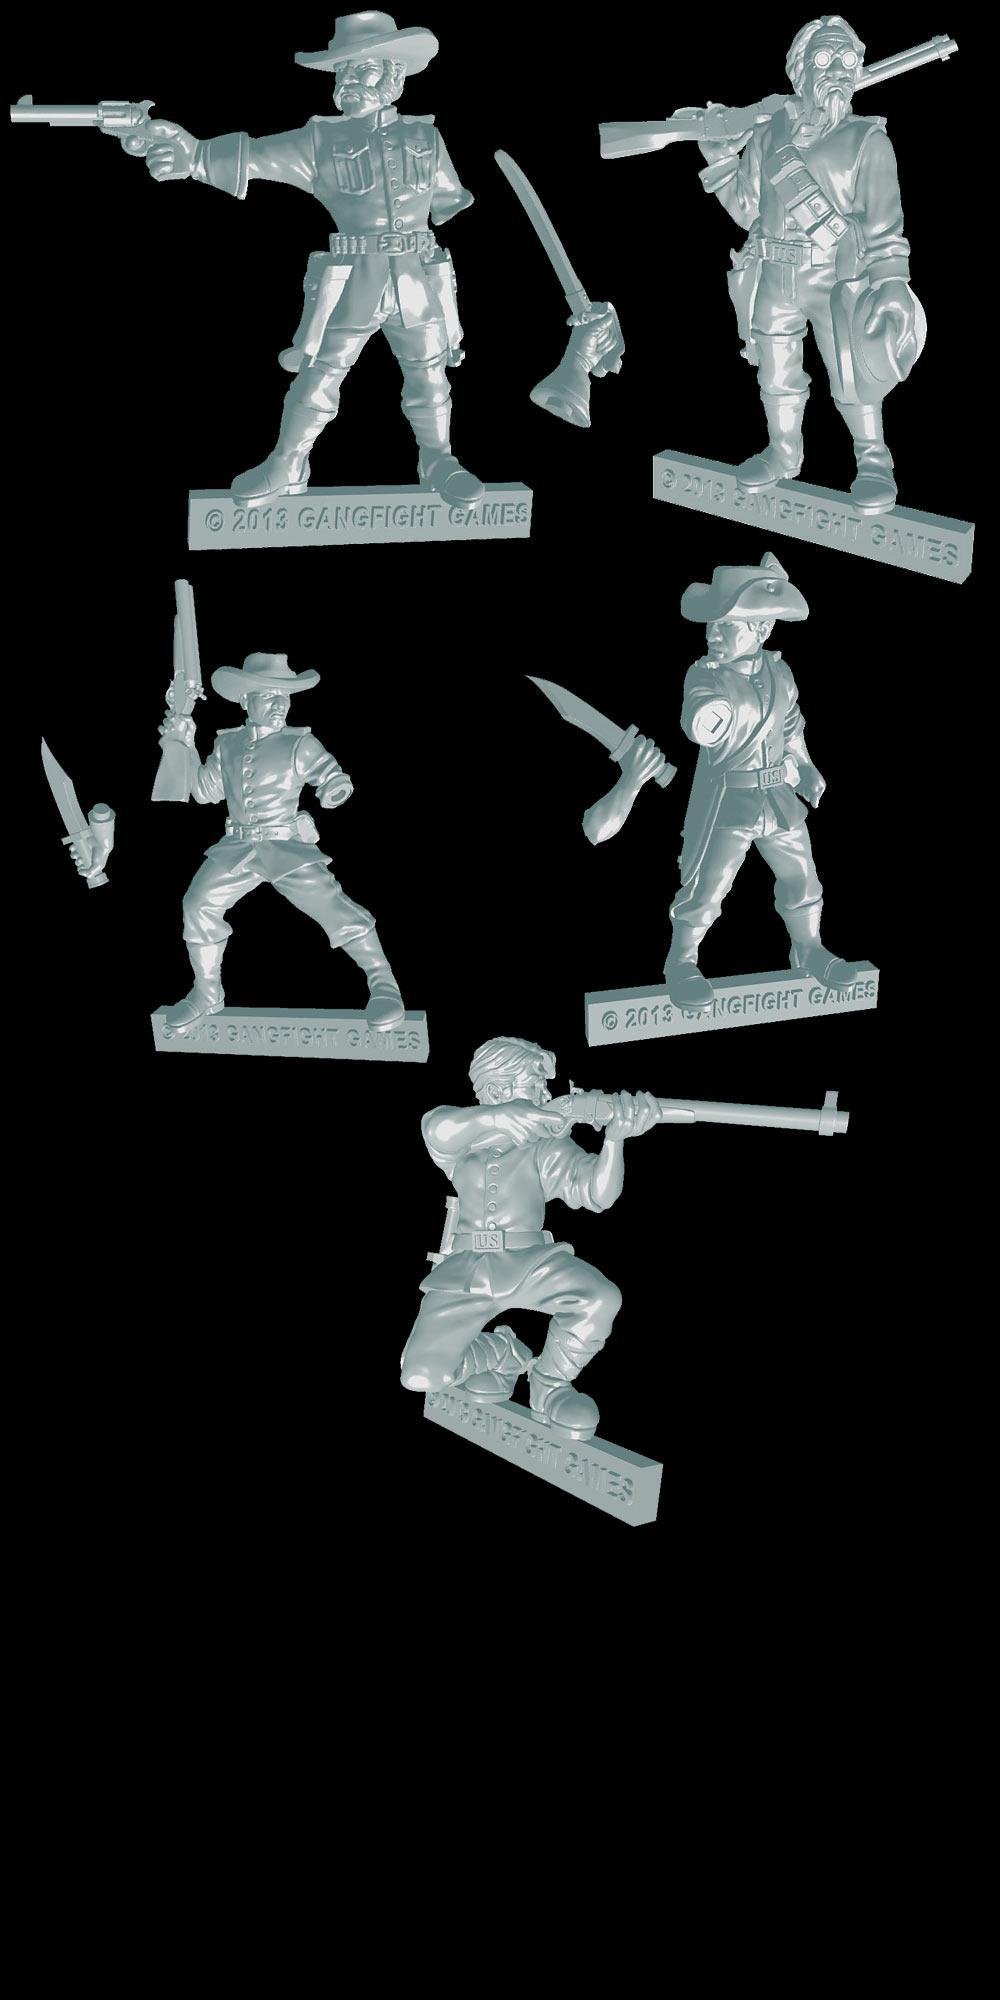 Wildes Rangers Sculpts